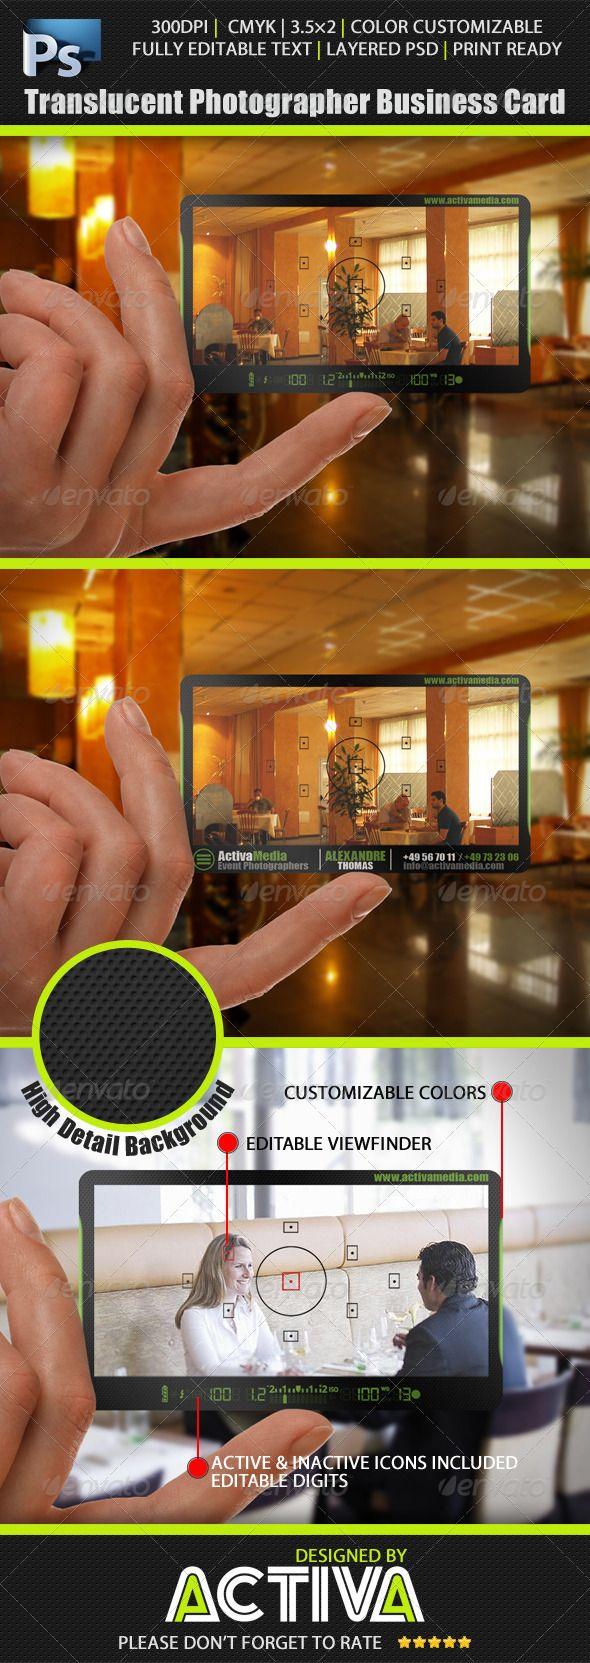 Translucent Photographer Business Card http://www.bce-online.com/en ...